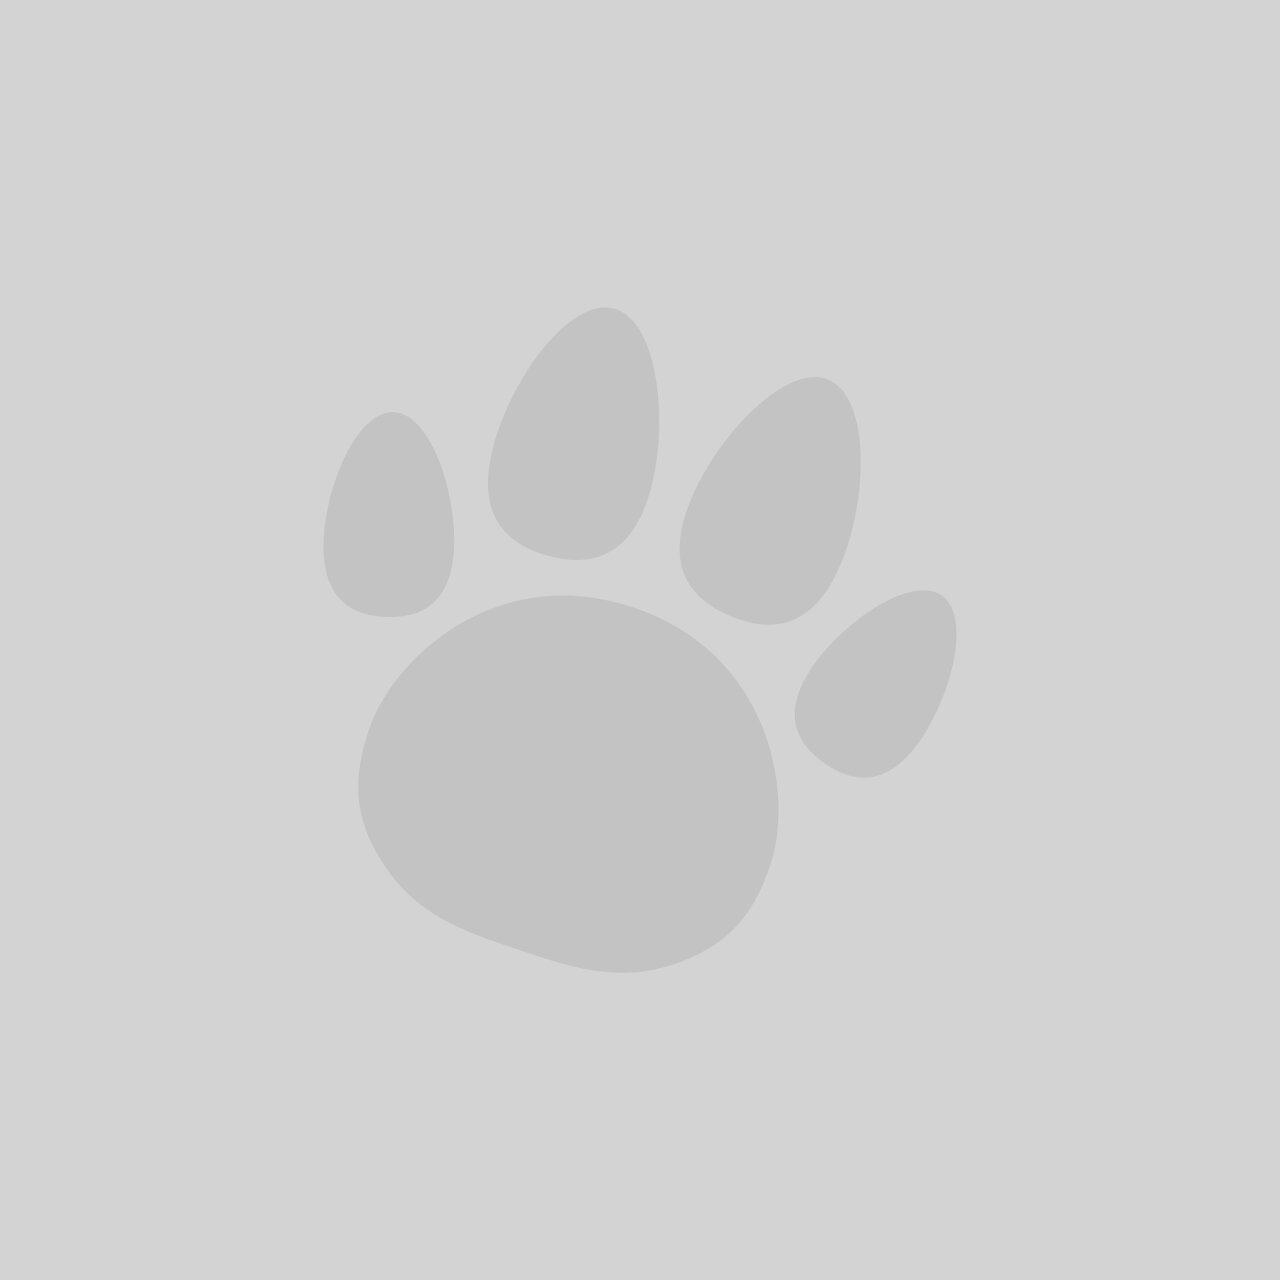 Beaphar Cat Comcomfort Calming Pheromone Spray 30ml